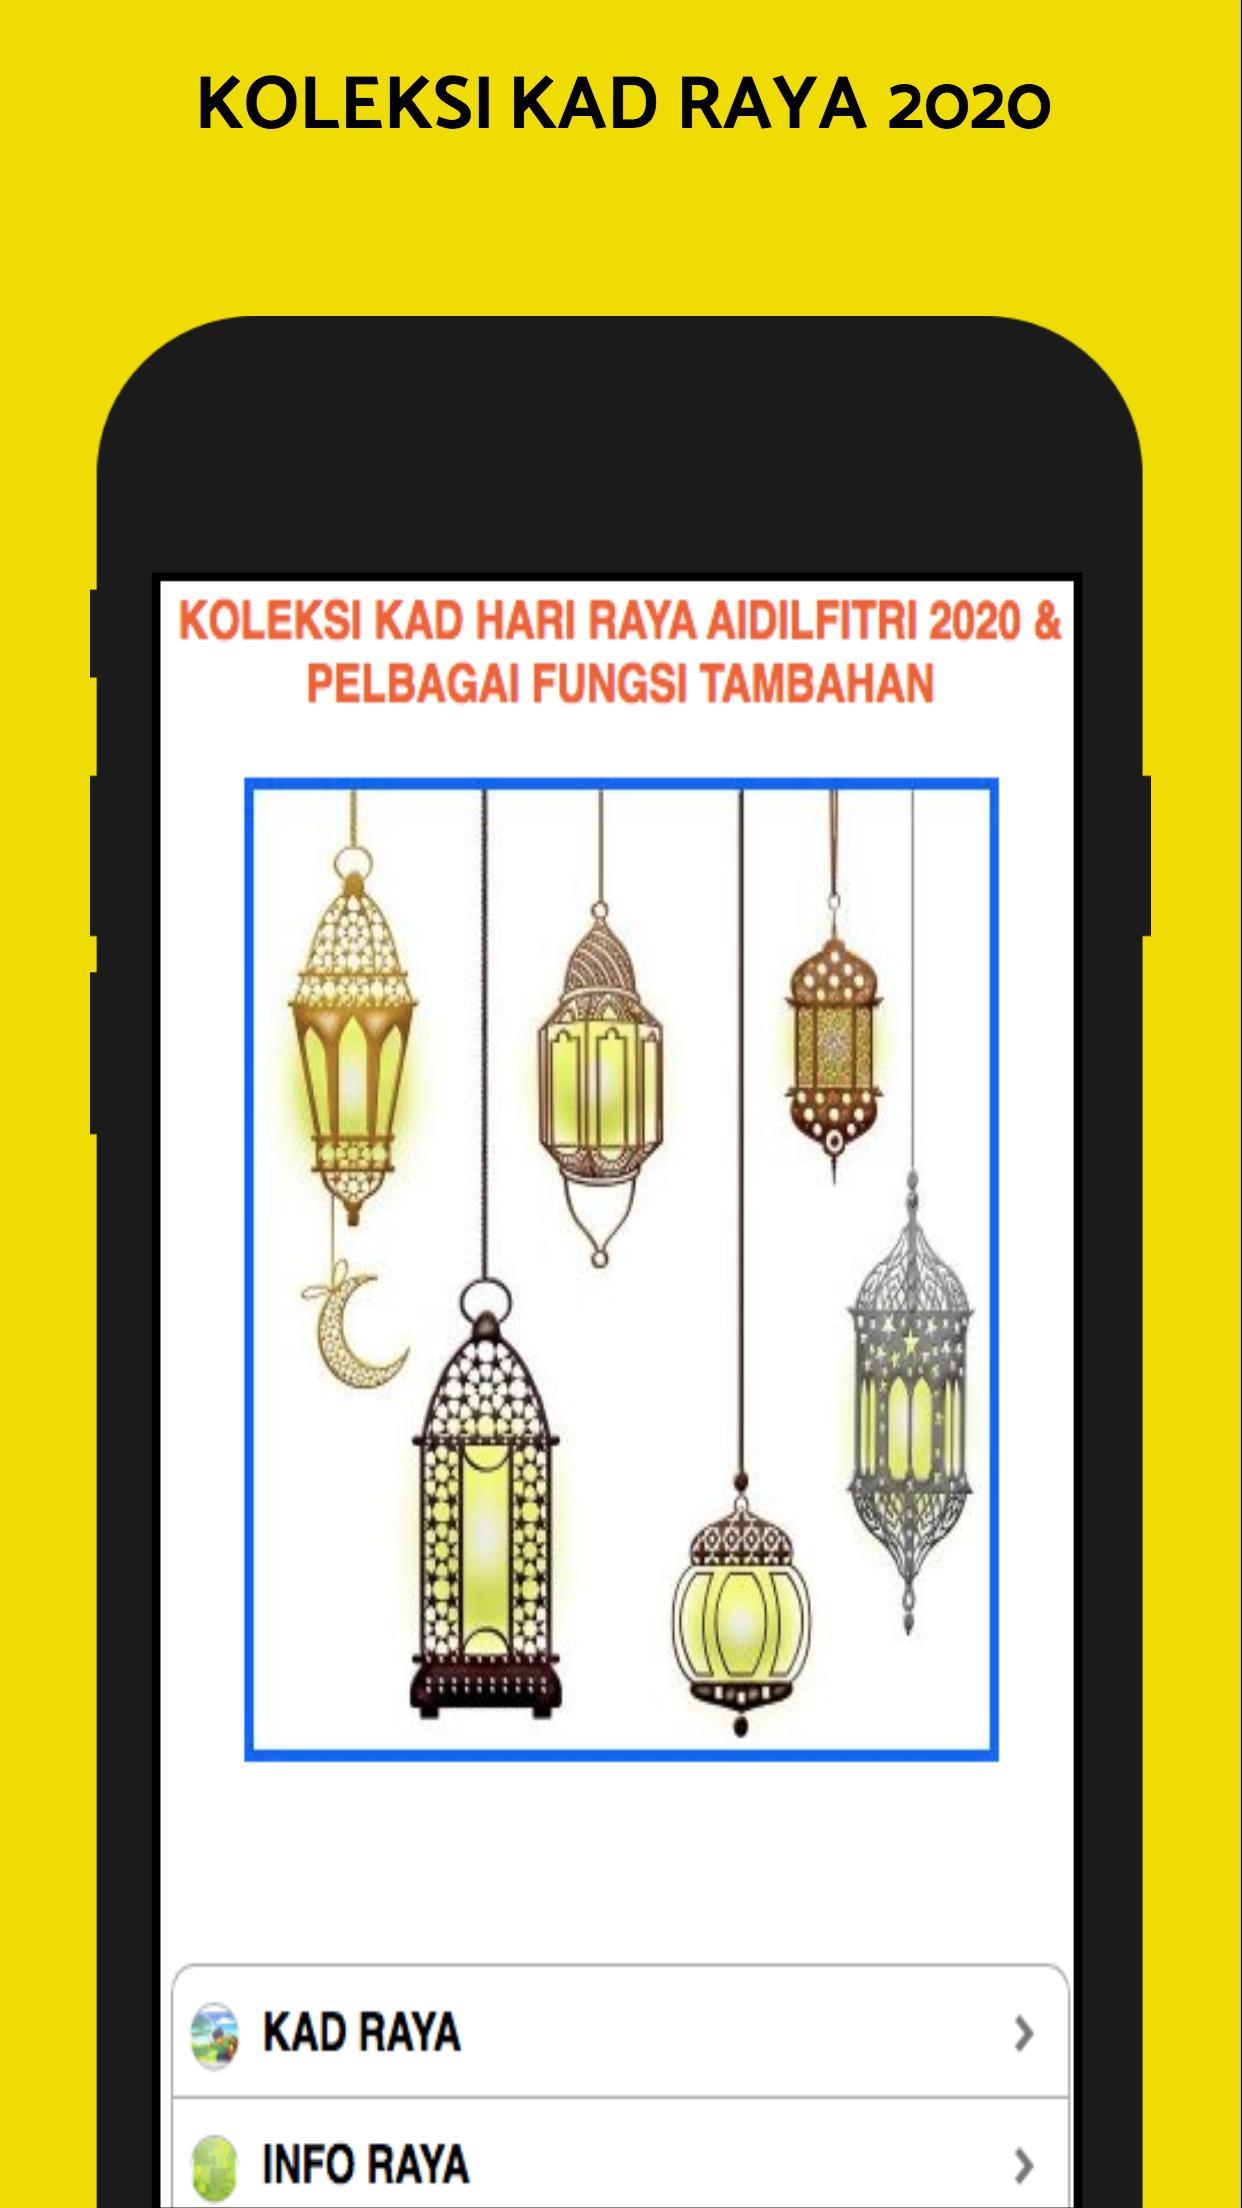 Kad Hari Raya Aidilfitri 2020 For Android Apk Download